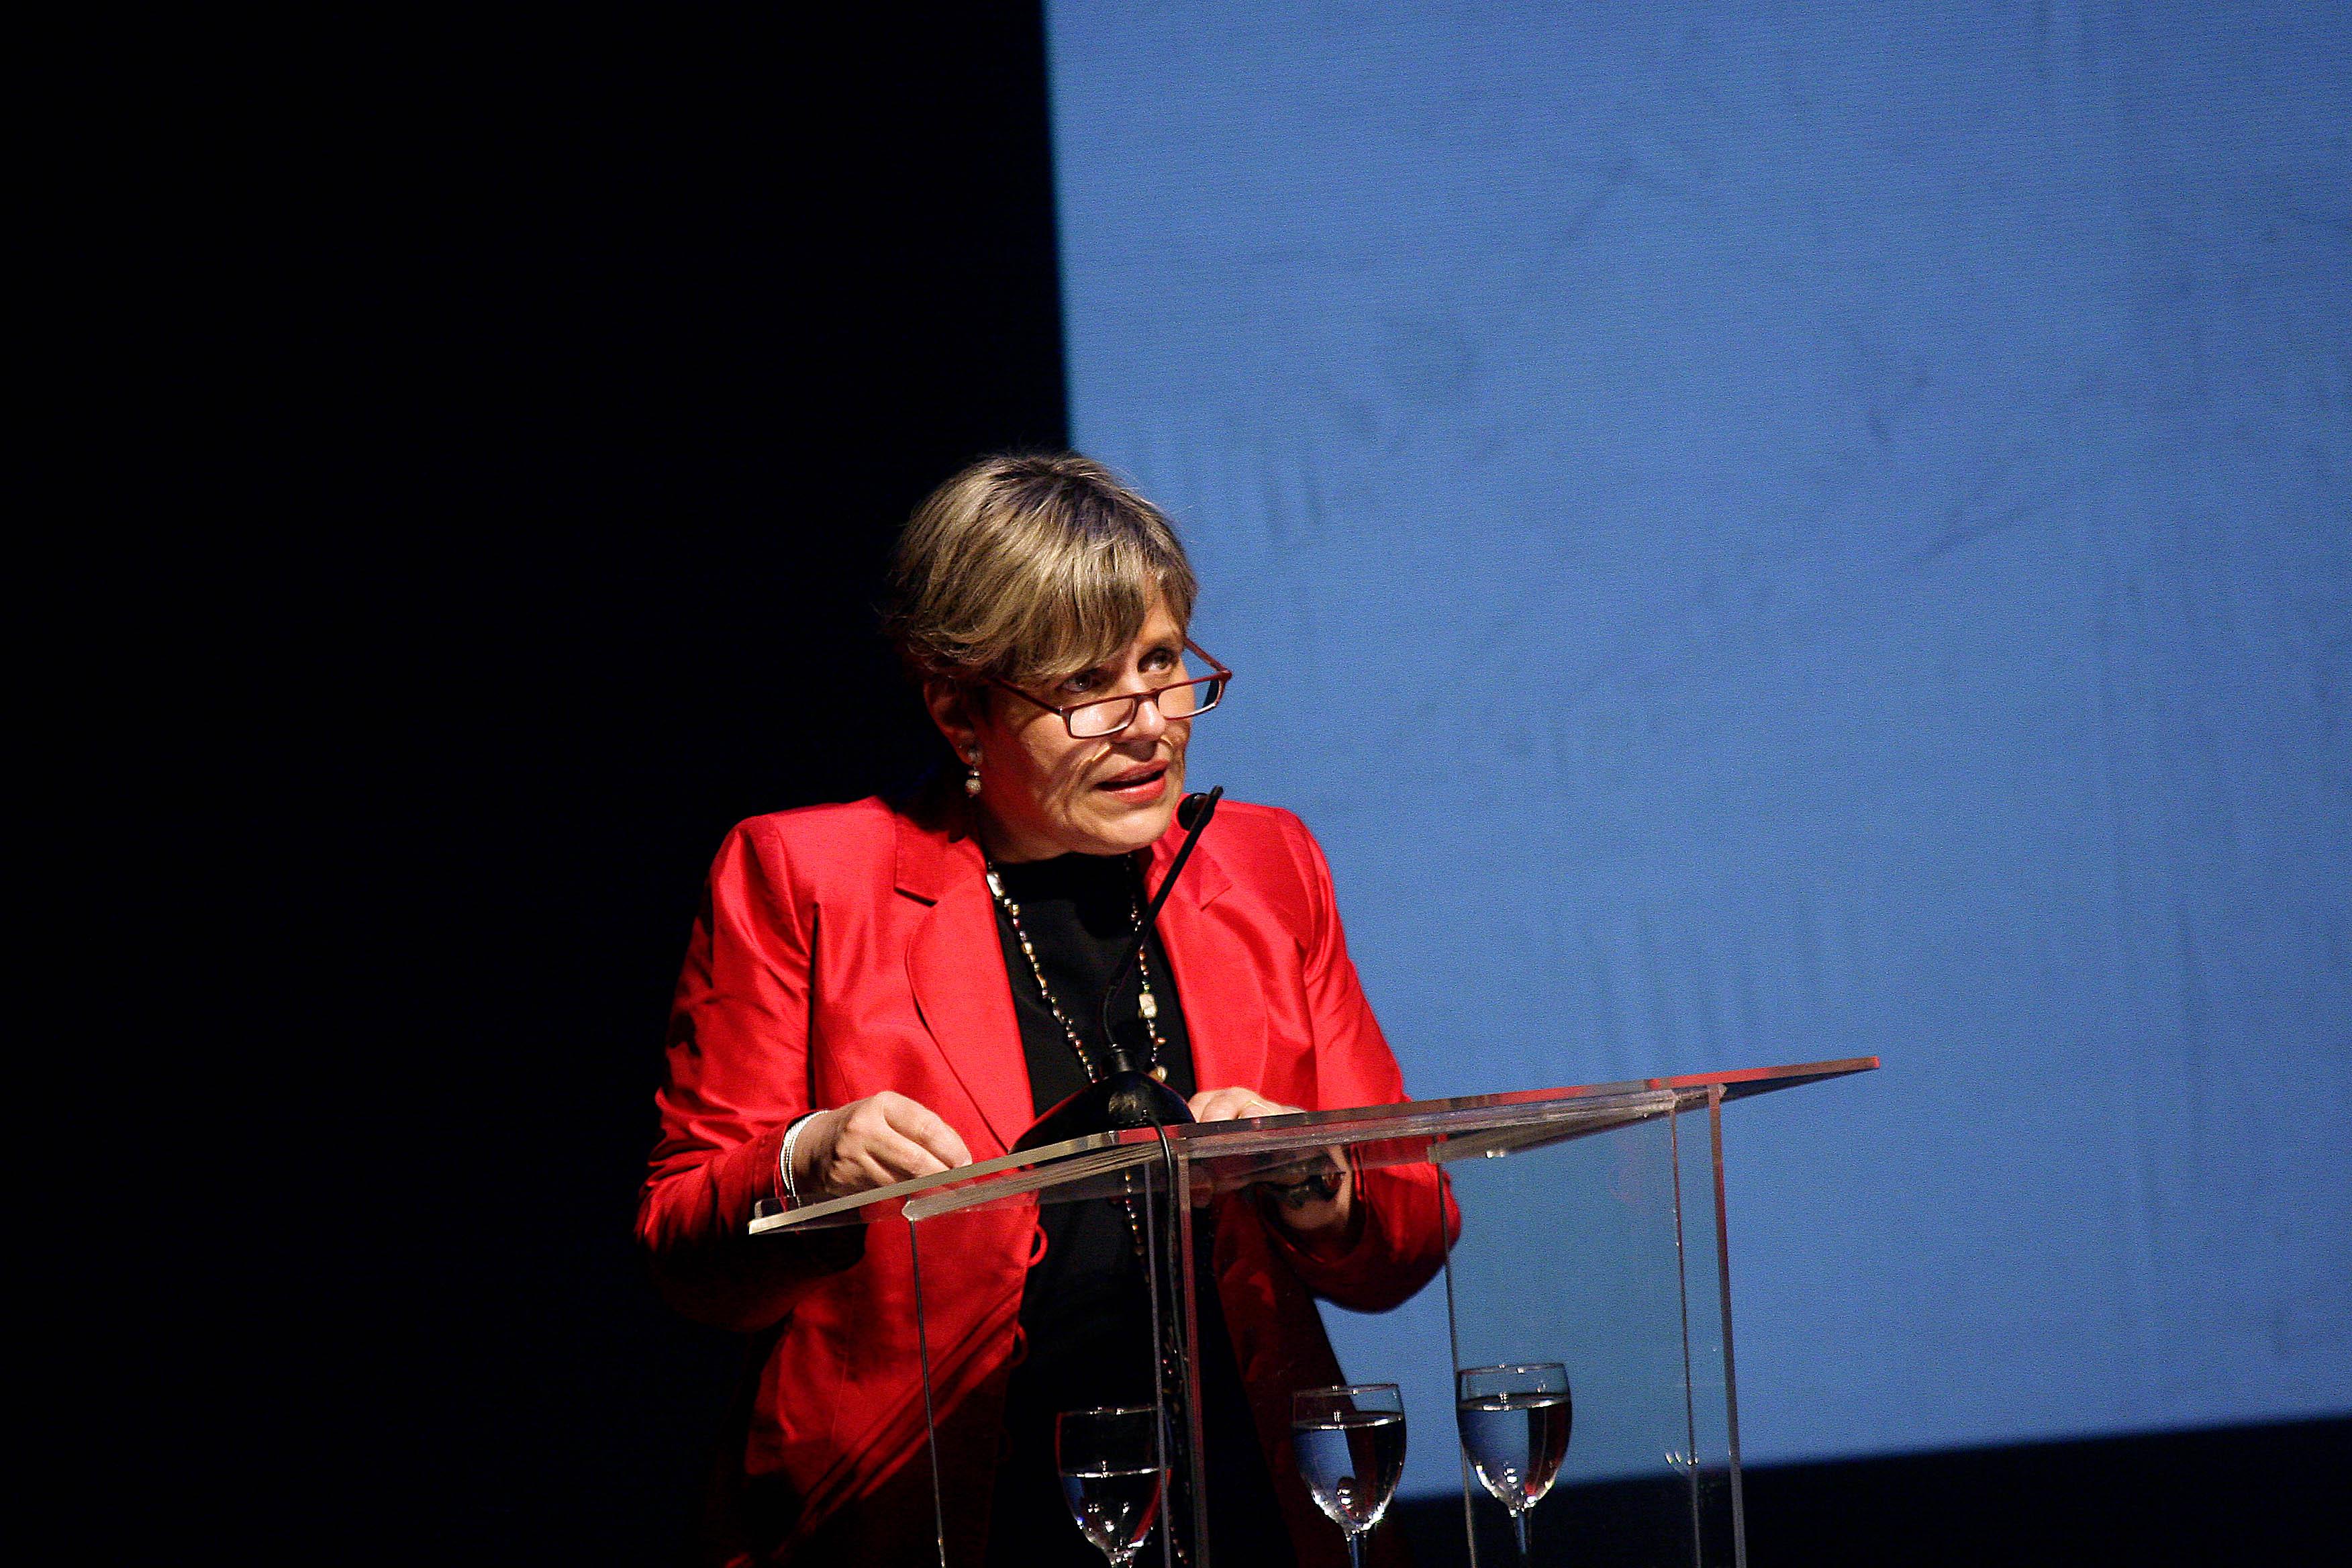 Lorena Fries | Pedro Cerda | Agencia UNO